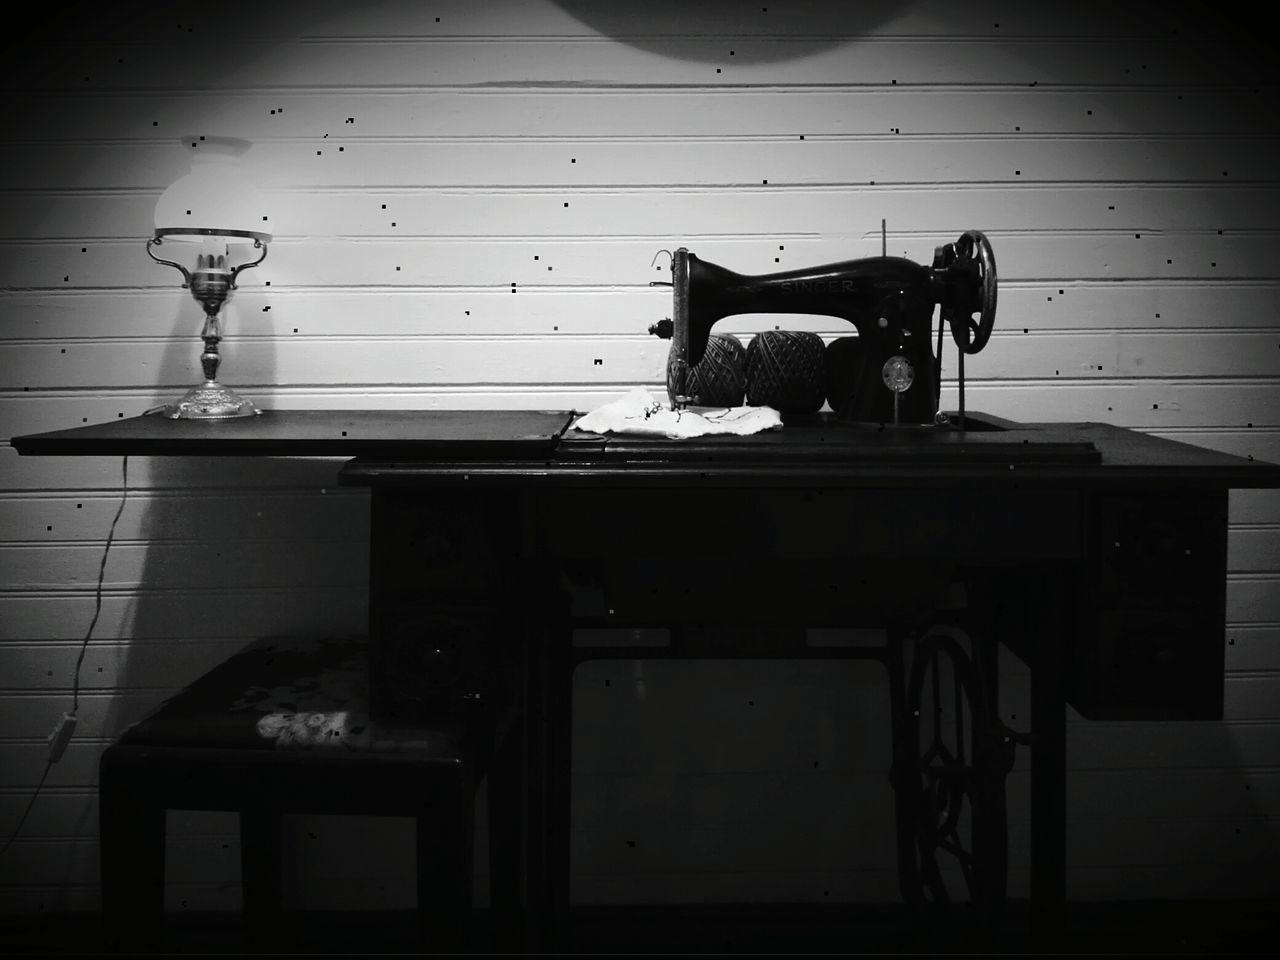 Homemade Food Home Sweet Home Coffee ☕ Pastries Go Out ,enjoy Life ❤ Restaurant Work Enjoying Life Pura Vida Taking Photos Decoration Interieure Decoration House Decoration Vintage Decoration Restaurant My World Of Food My Working Place